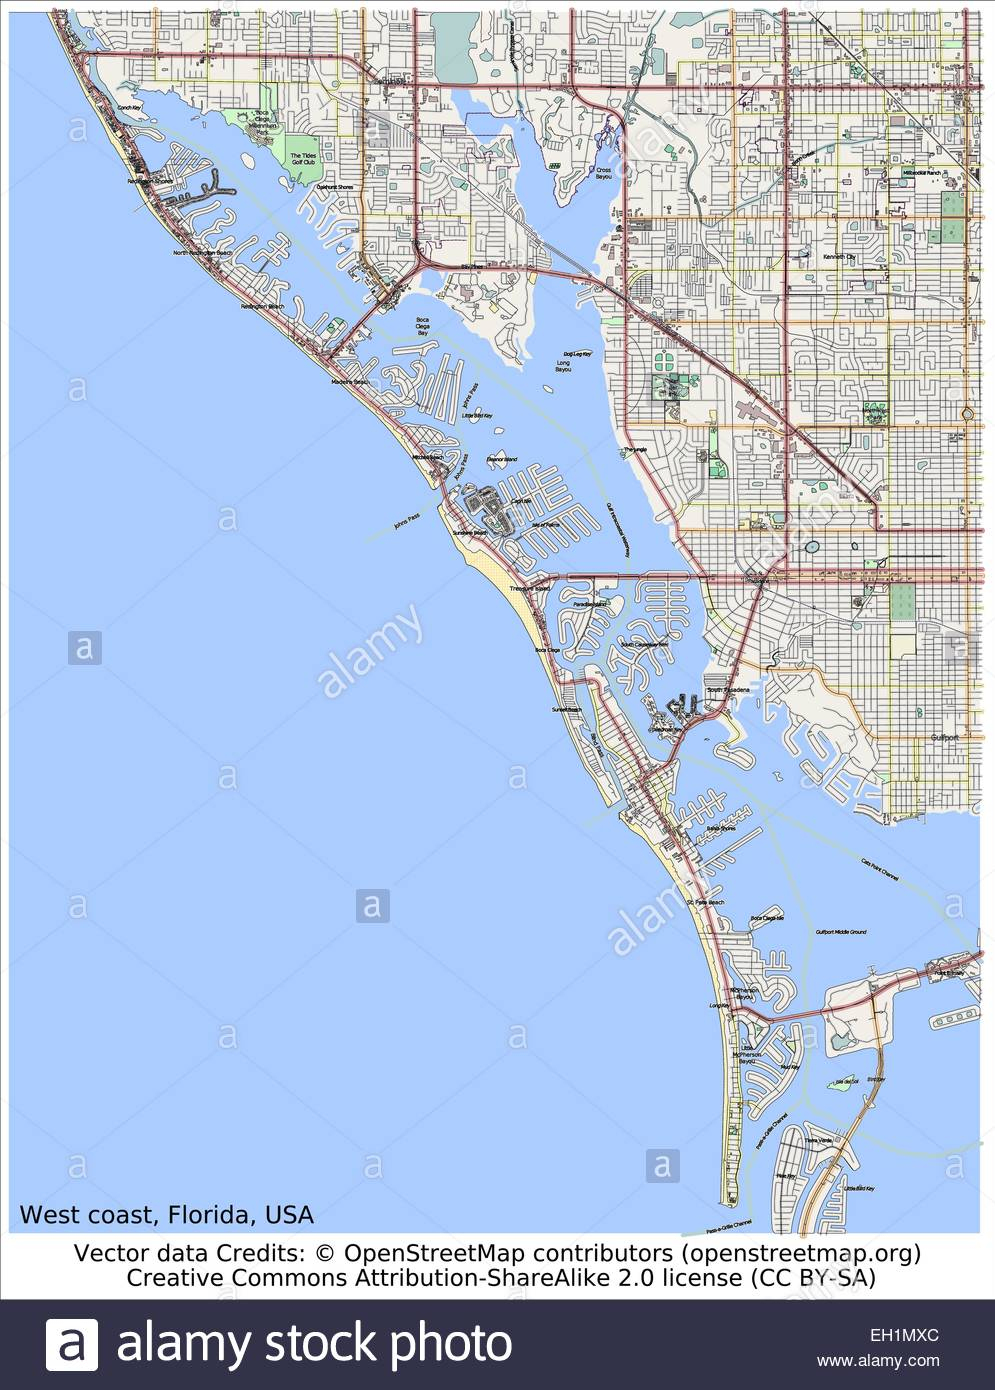 West Coast Florida Usa Area Map Stock Vector Art & Illustration - Map Of West Coast Of Florida Usa